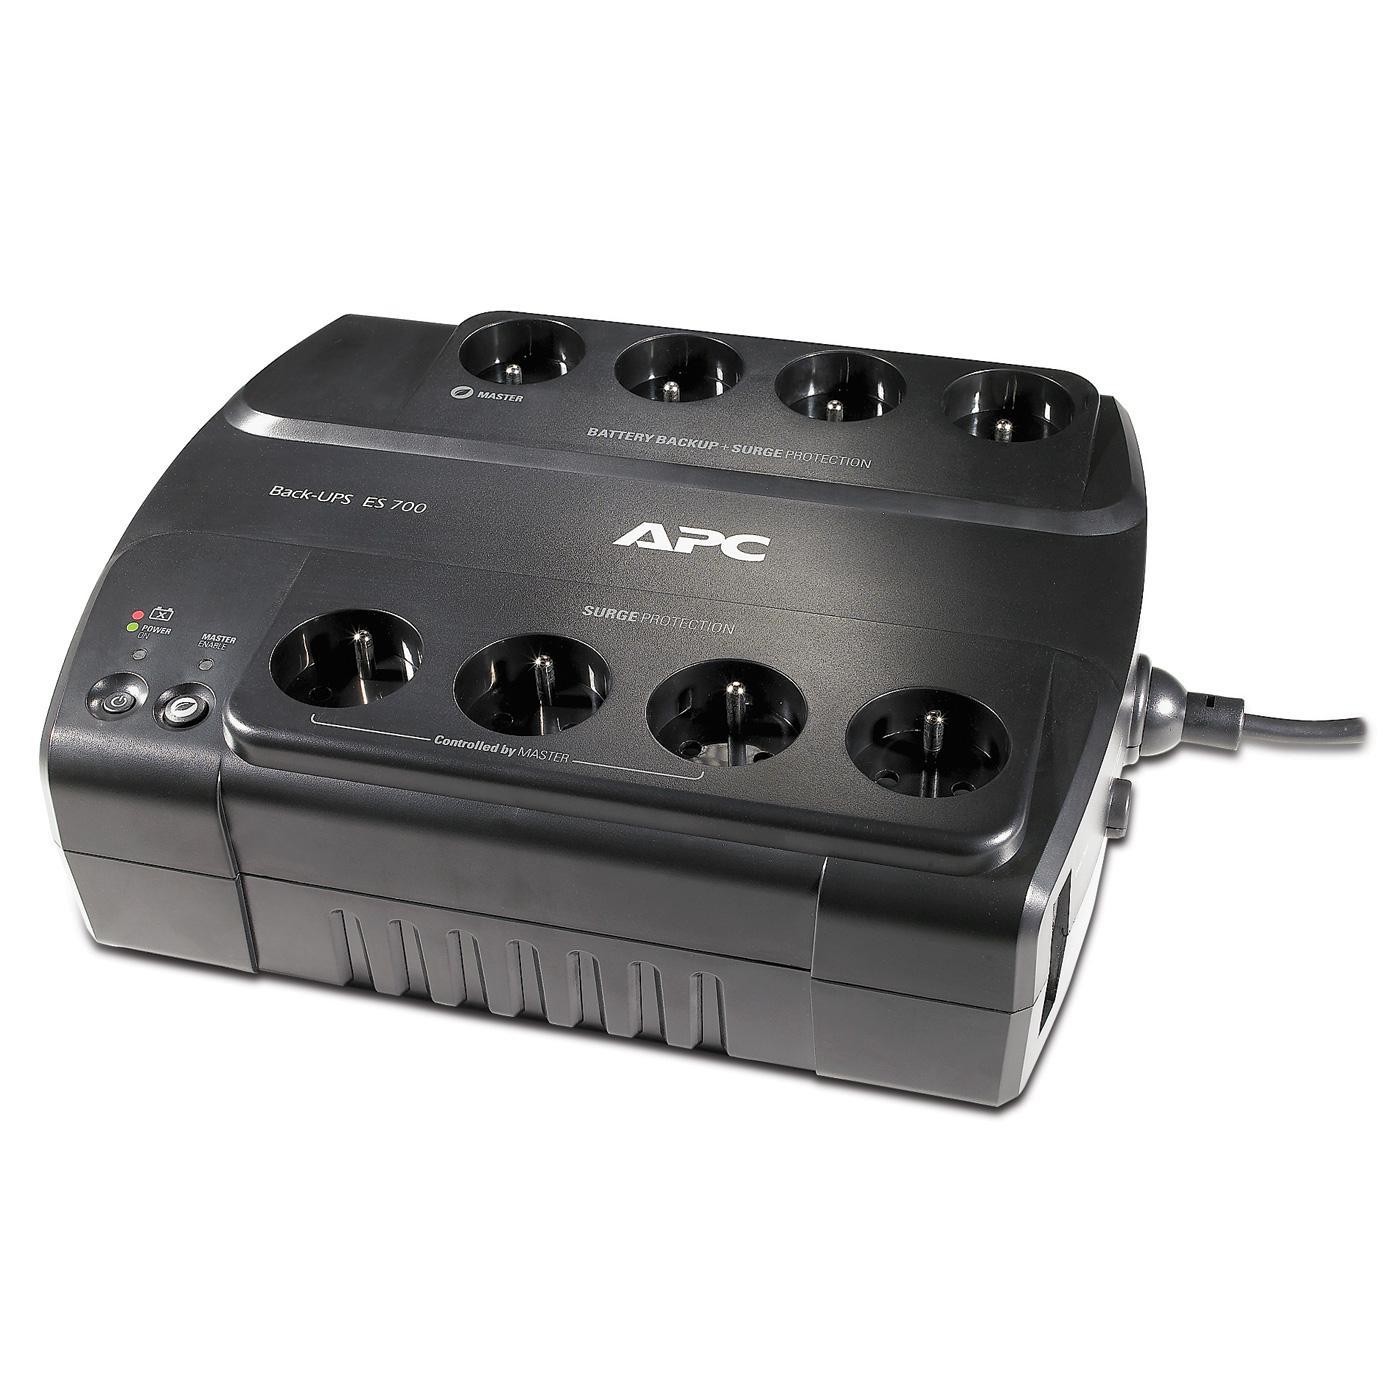 Onduleur parafoudre APC Back-UPS ES BE700G-FR (8 prises, 700VA/405W, 230V, CEE 7/5)